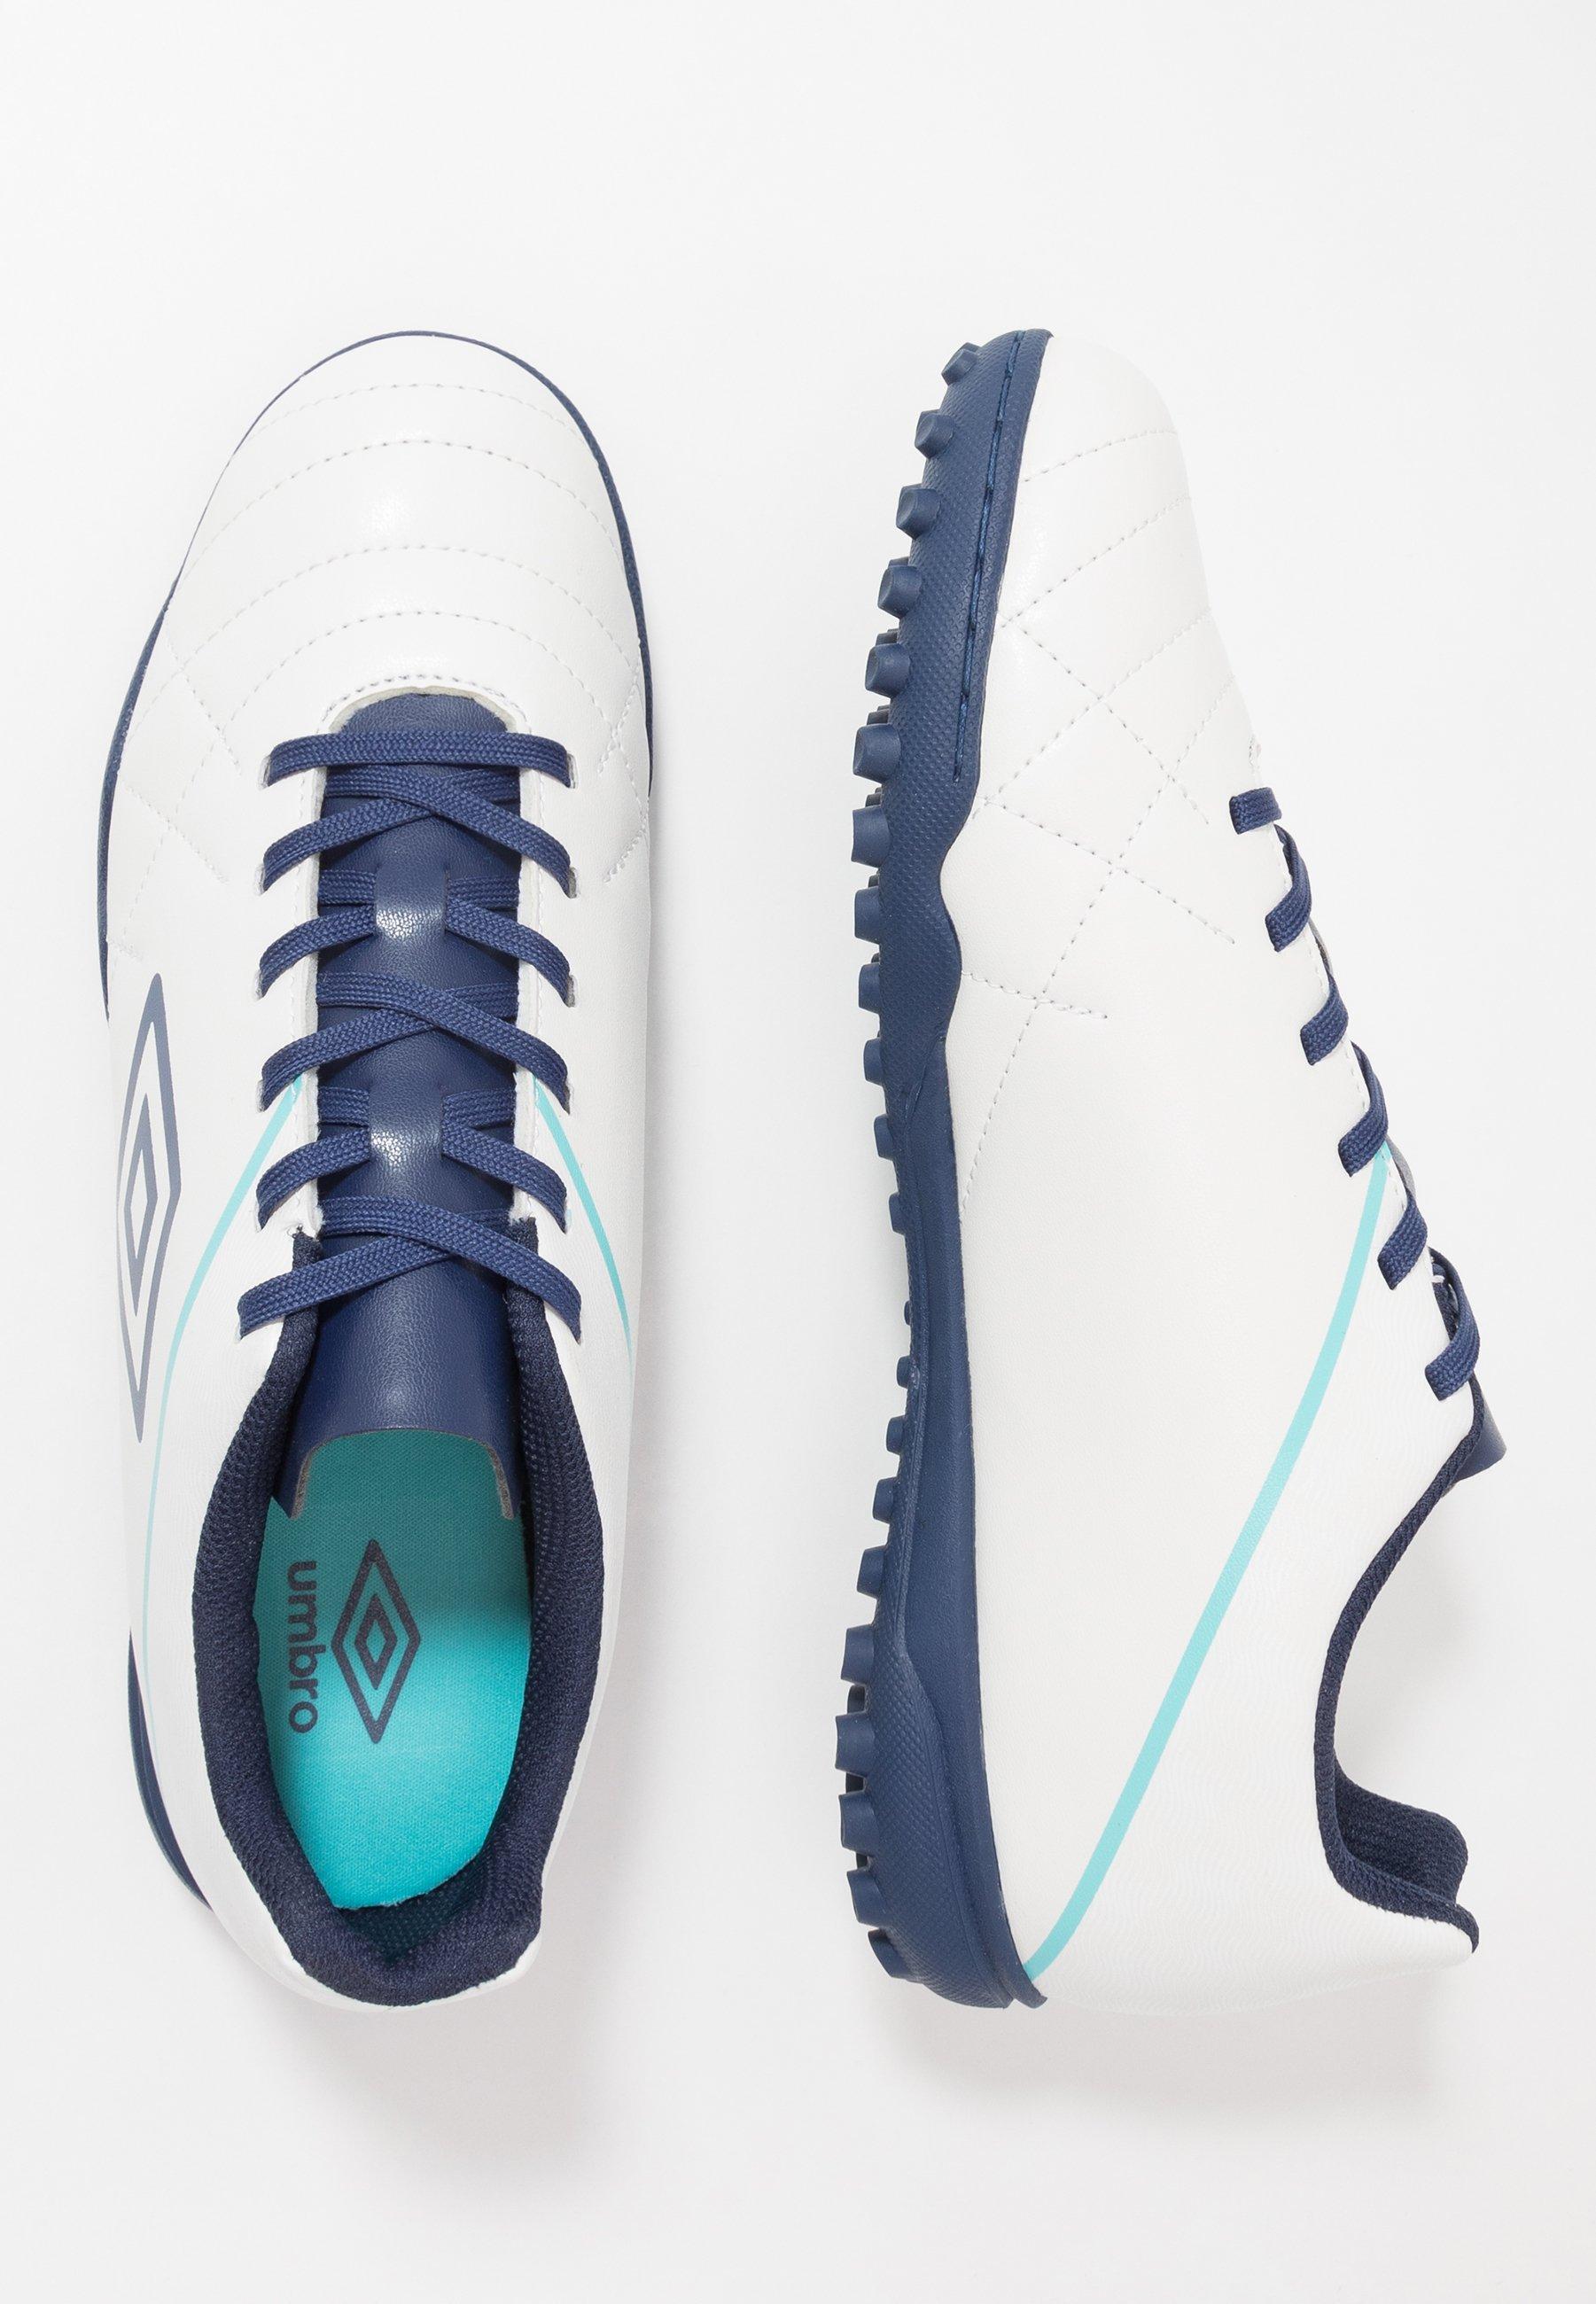 Umbro Medusæ Iii League Tf - Fotbollsskor Universaldobbar White/medieval Blue/blue Radiance